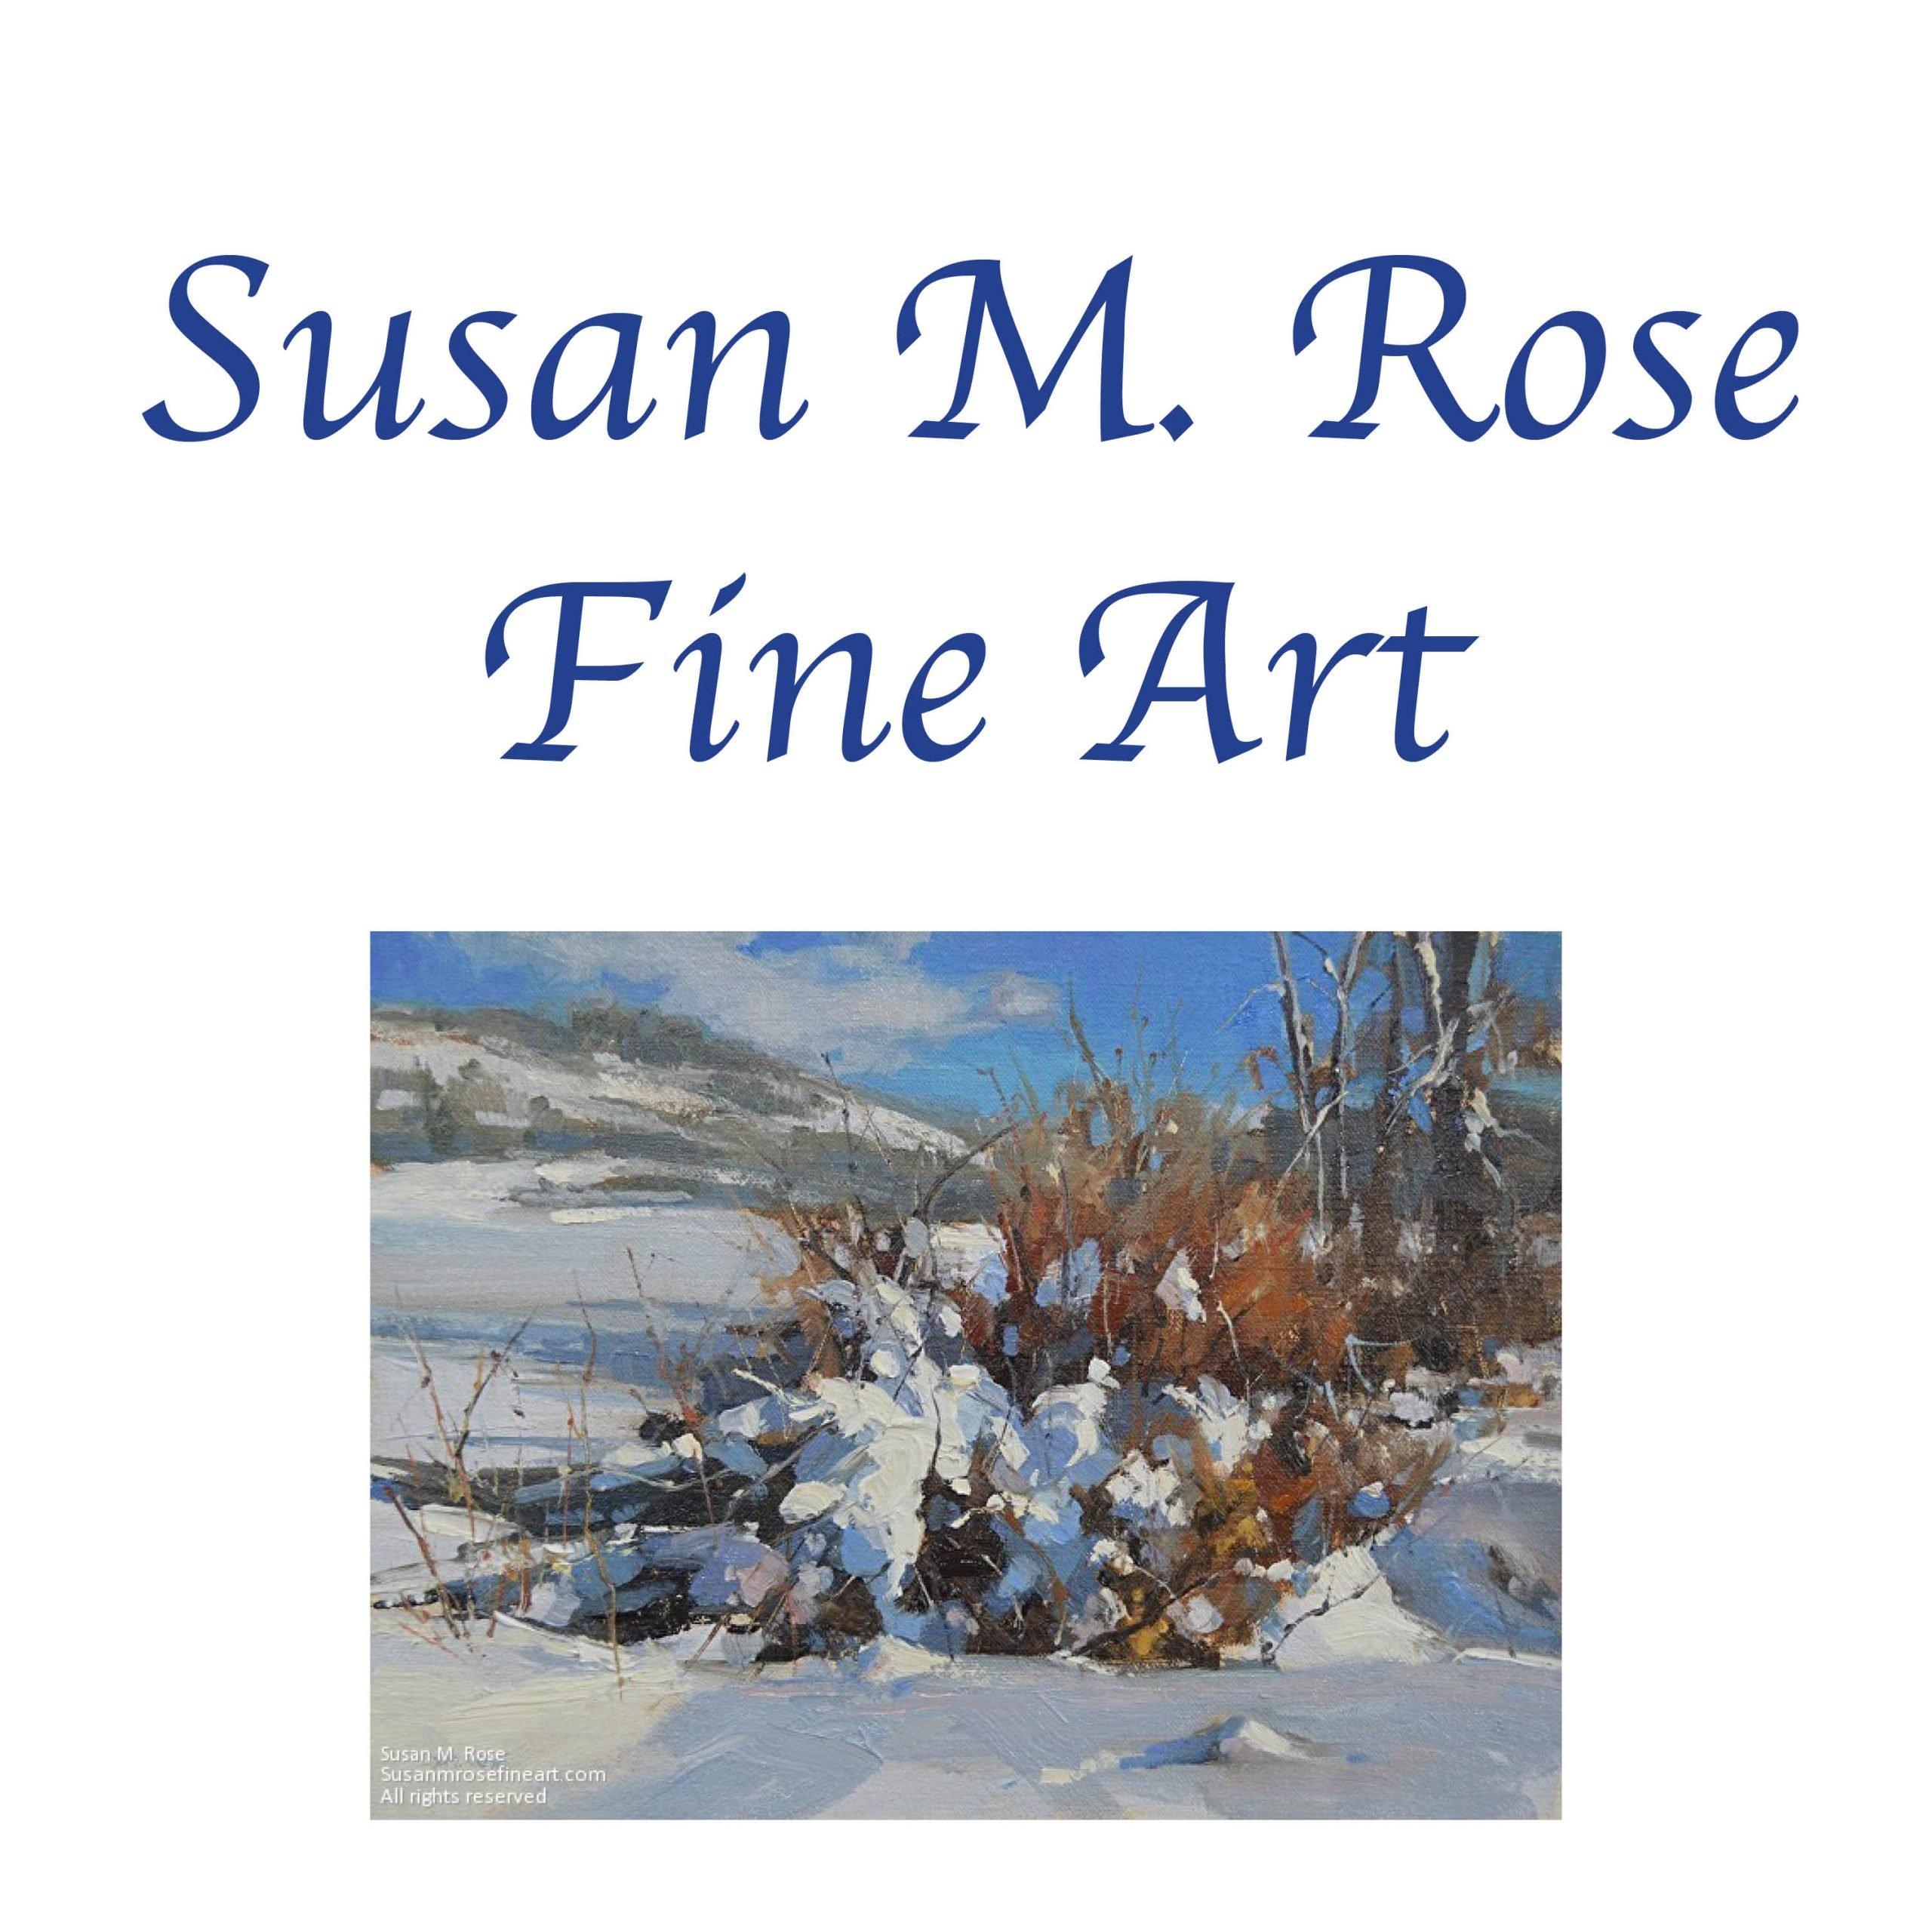 Susan M. Rose Fine Art